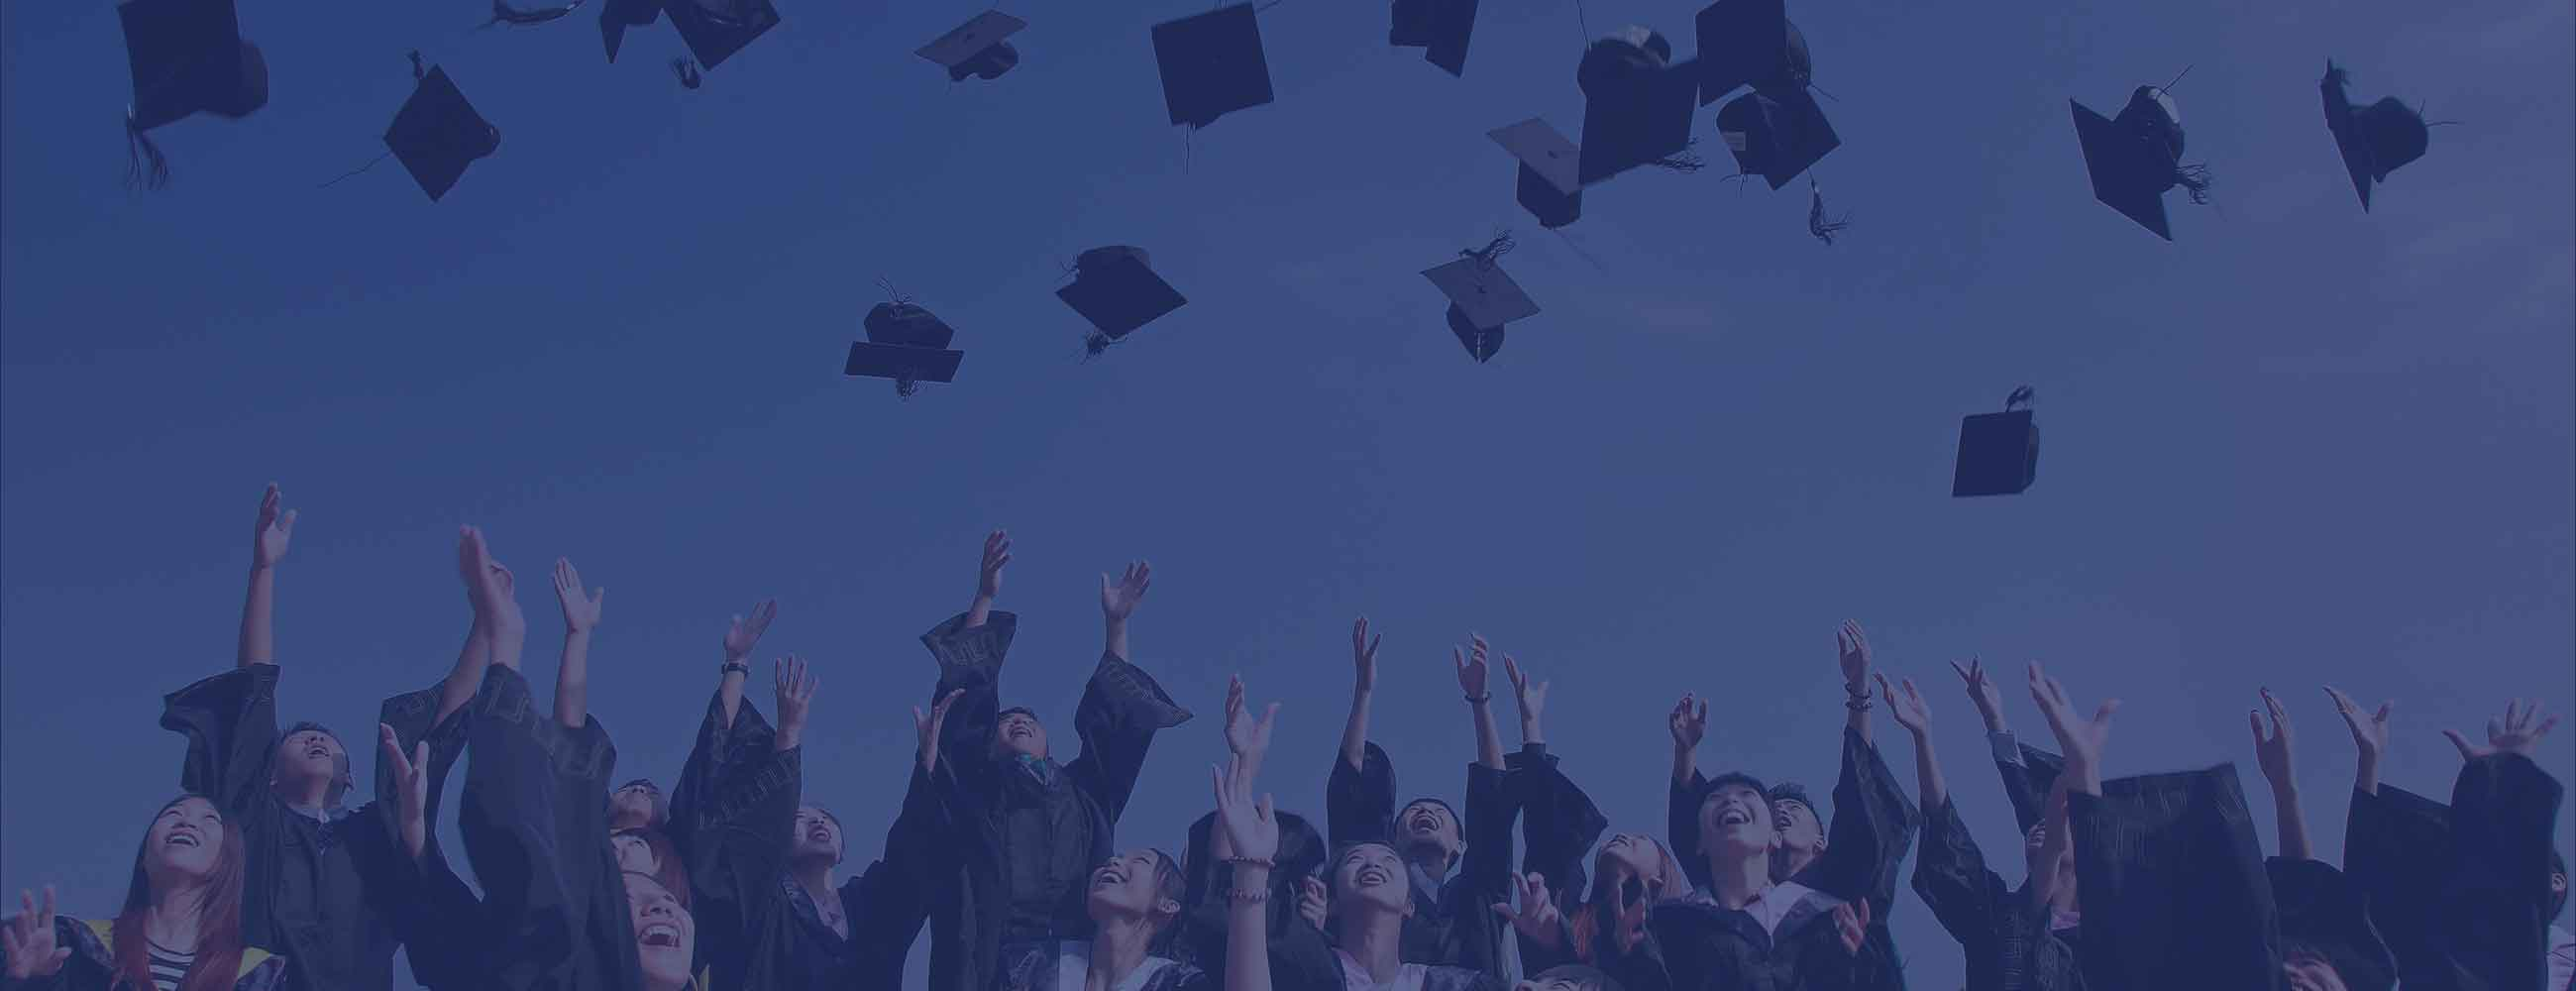 School and Graduation Image Sales